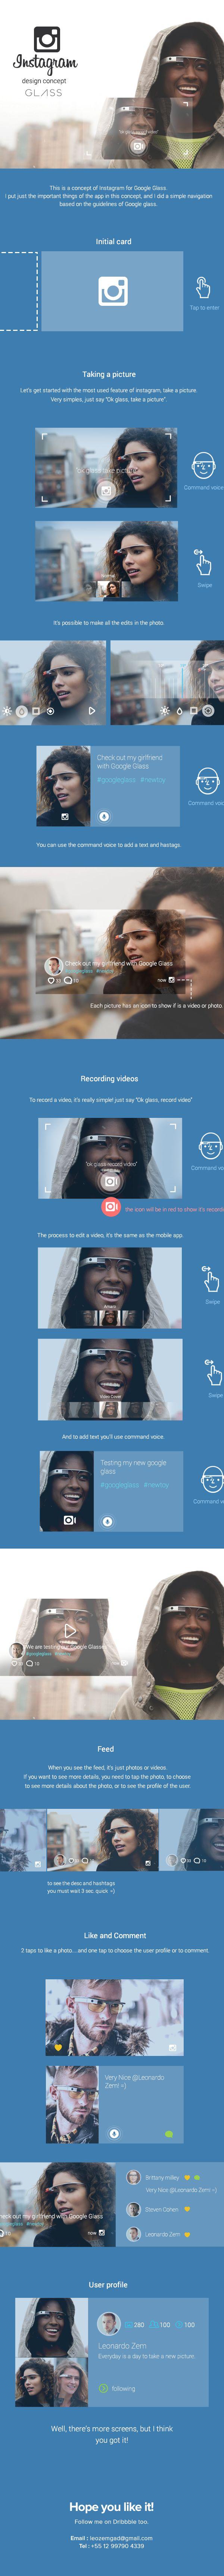 Instagram for Google Glass by Leonardo Zem, via Behance